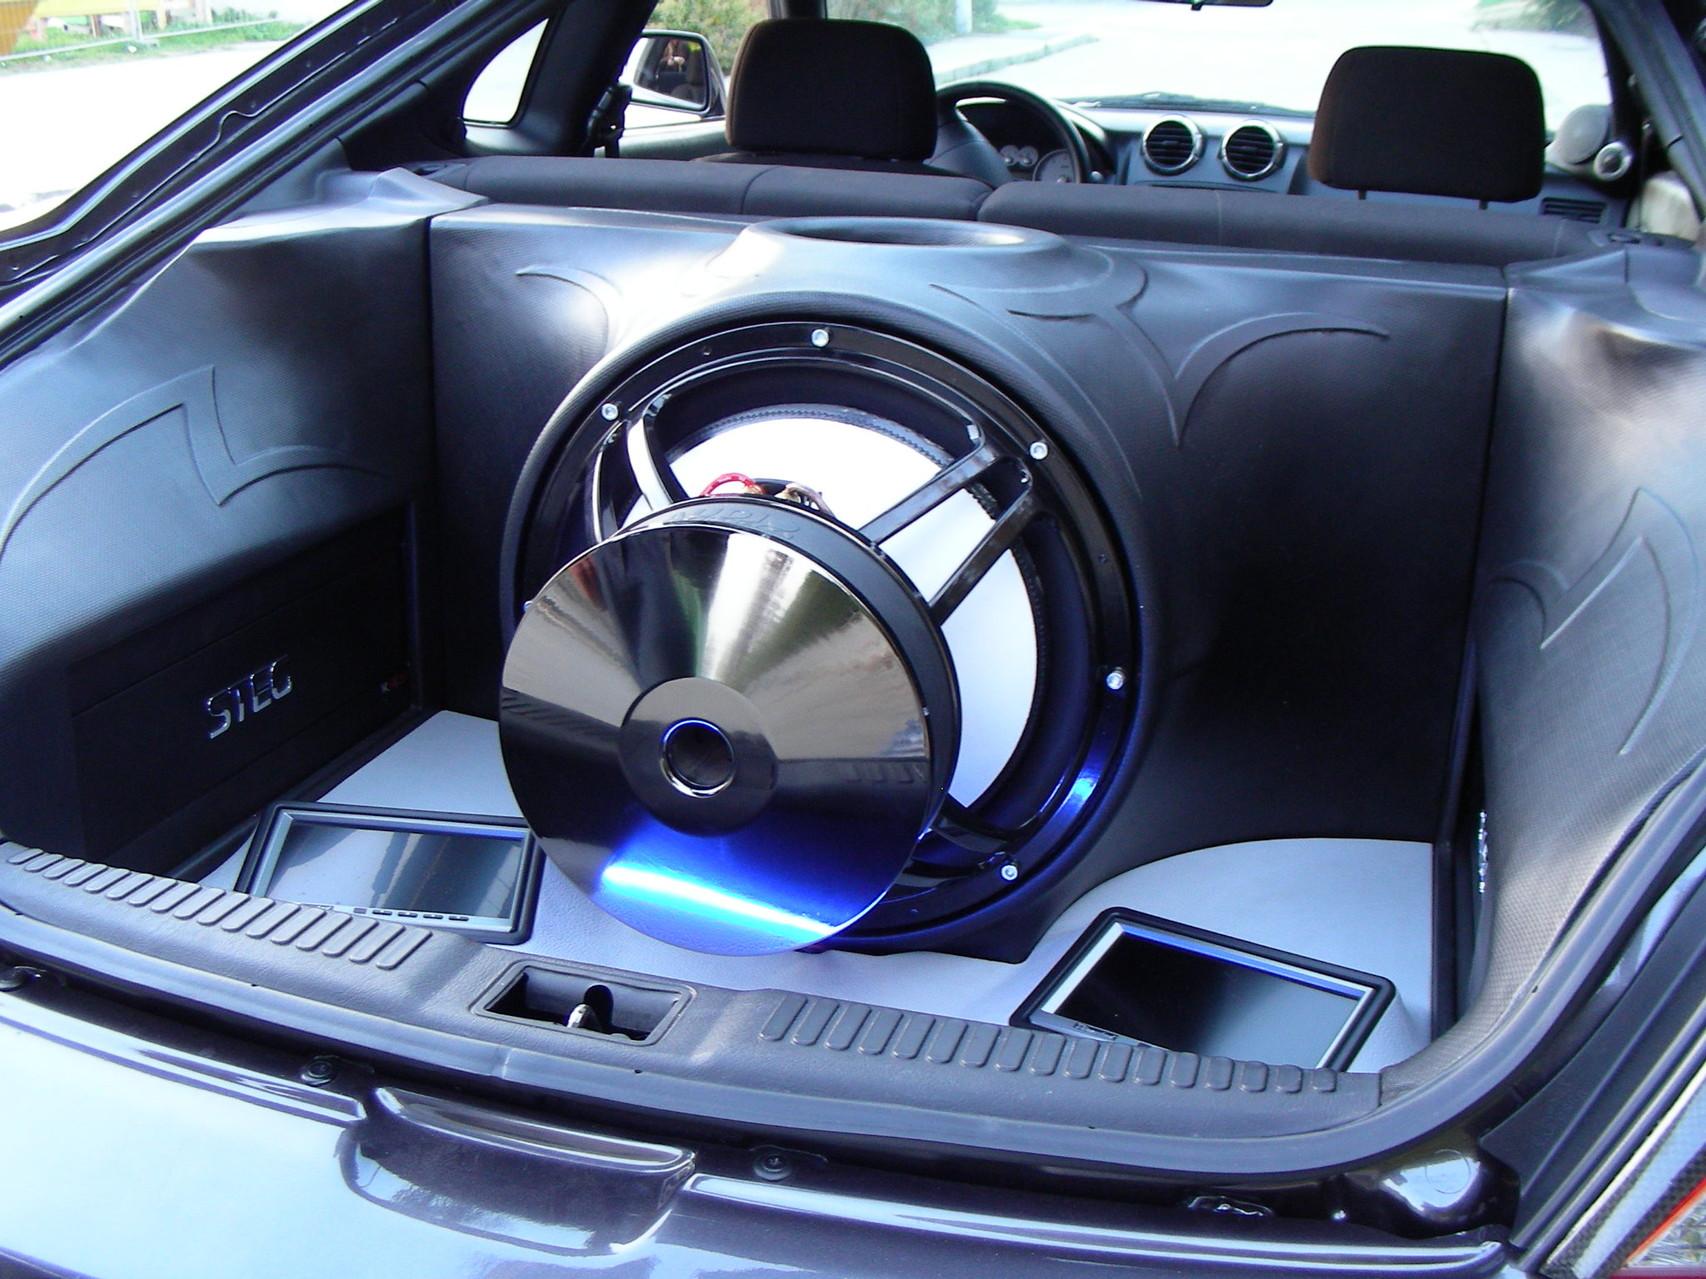 Hyundai Tiburon - Kofferraumverbau